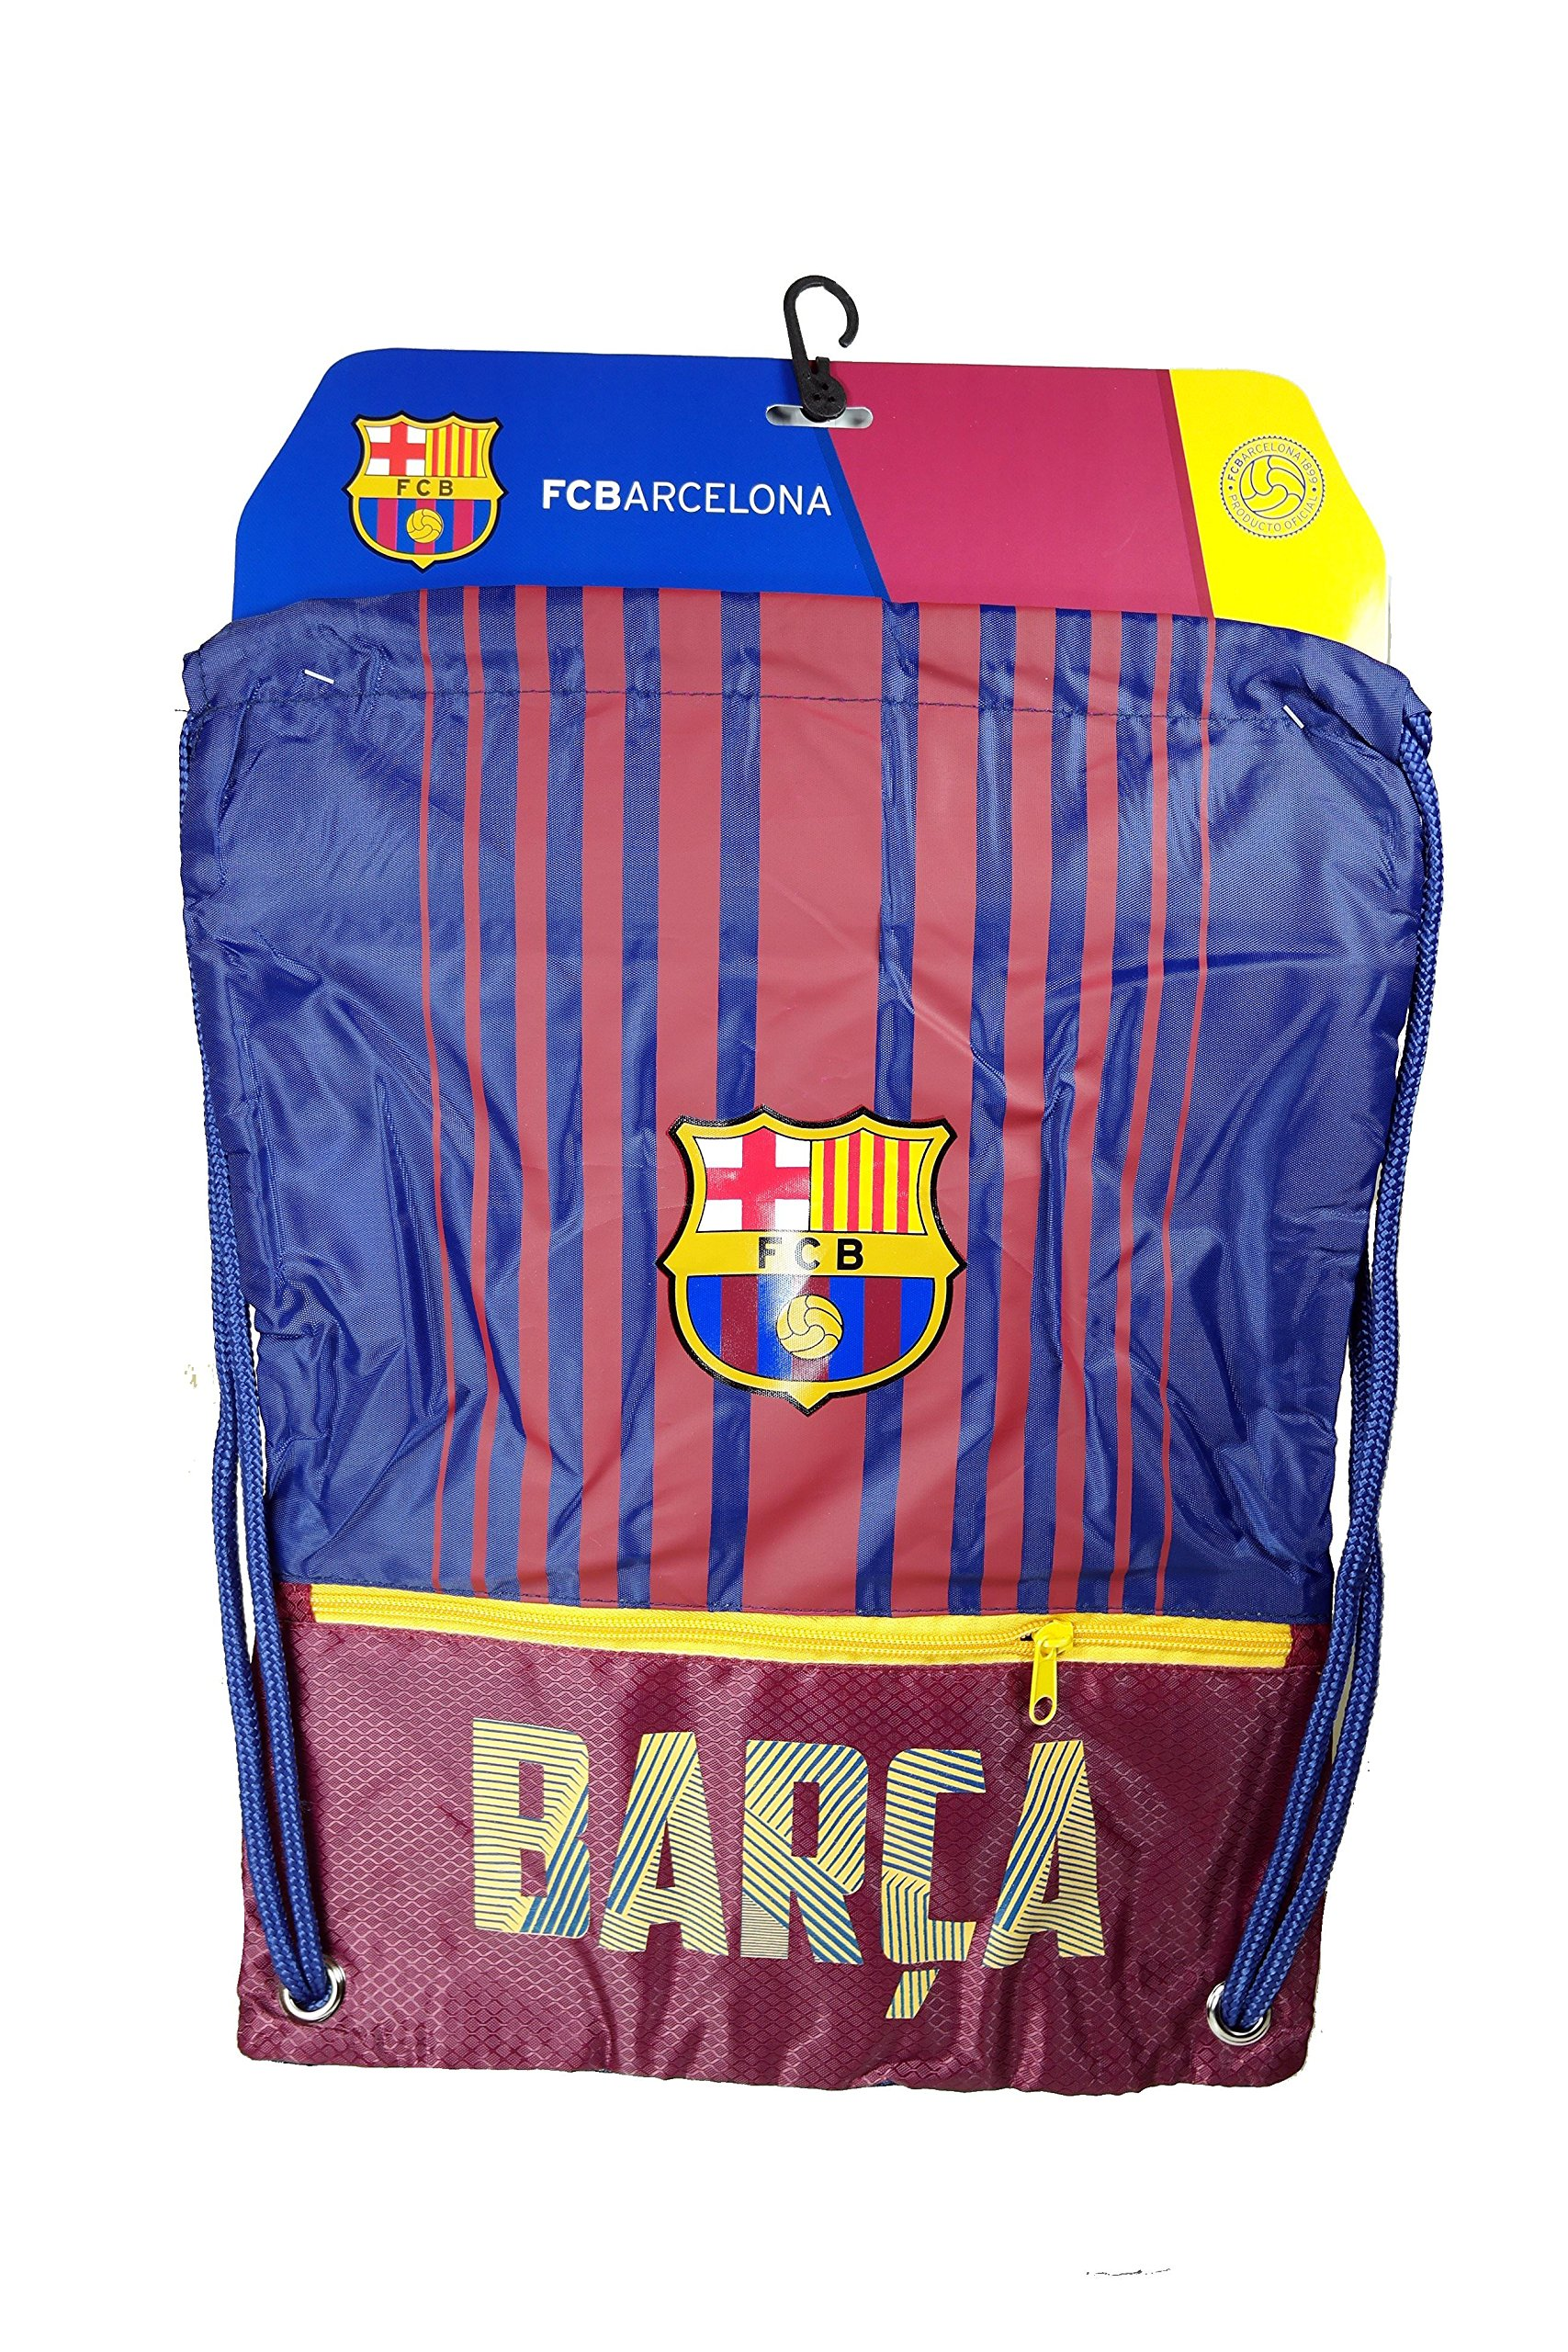 Fc Barcelona Authentic Official Licensed Soccer Drawstring Cinch Sack Bag 019